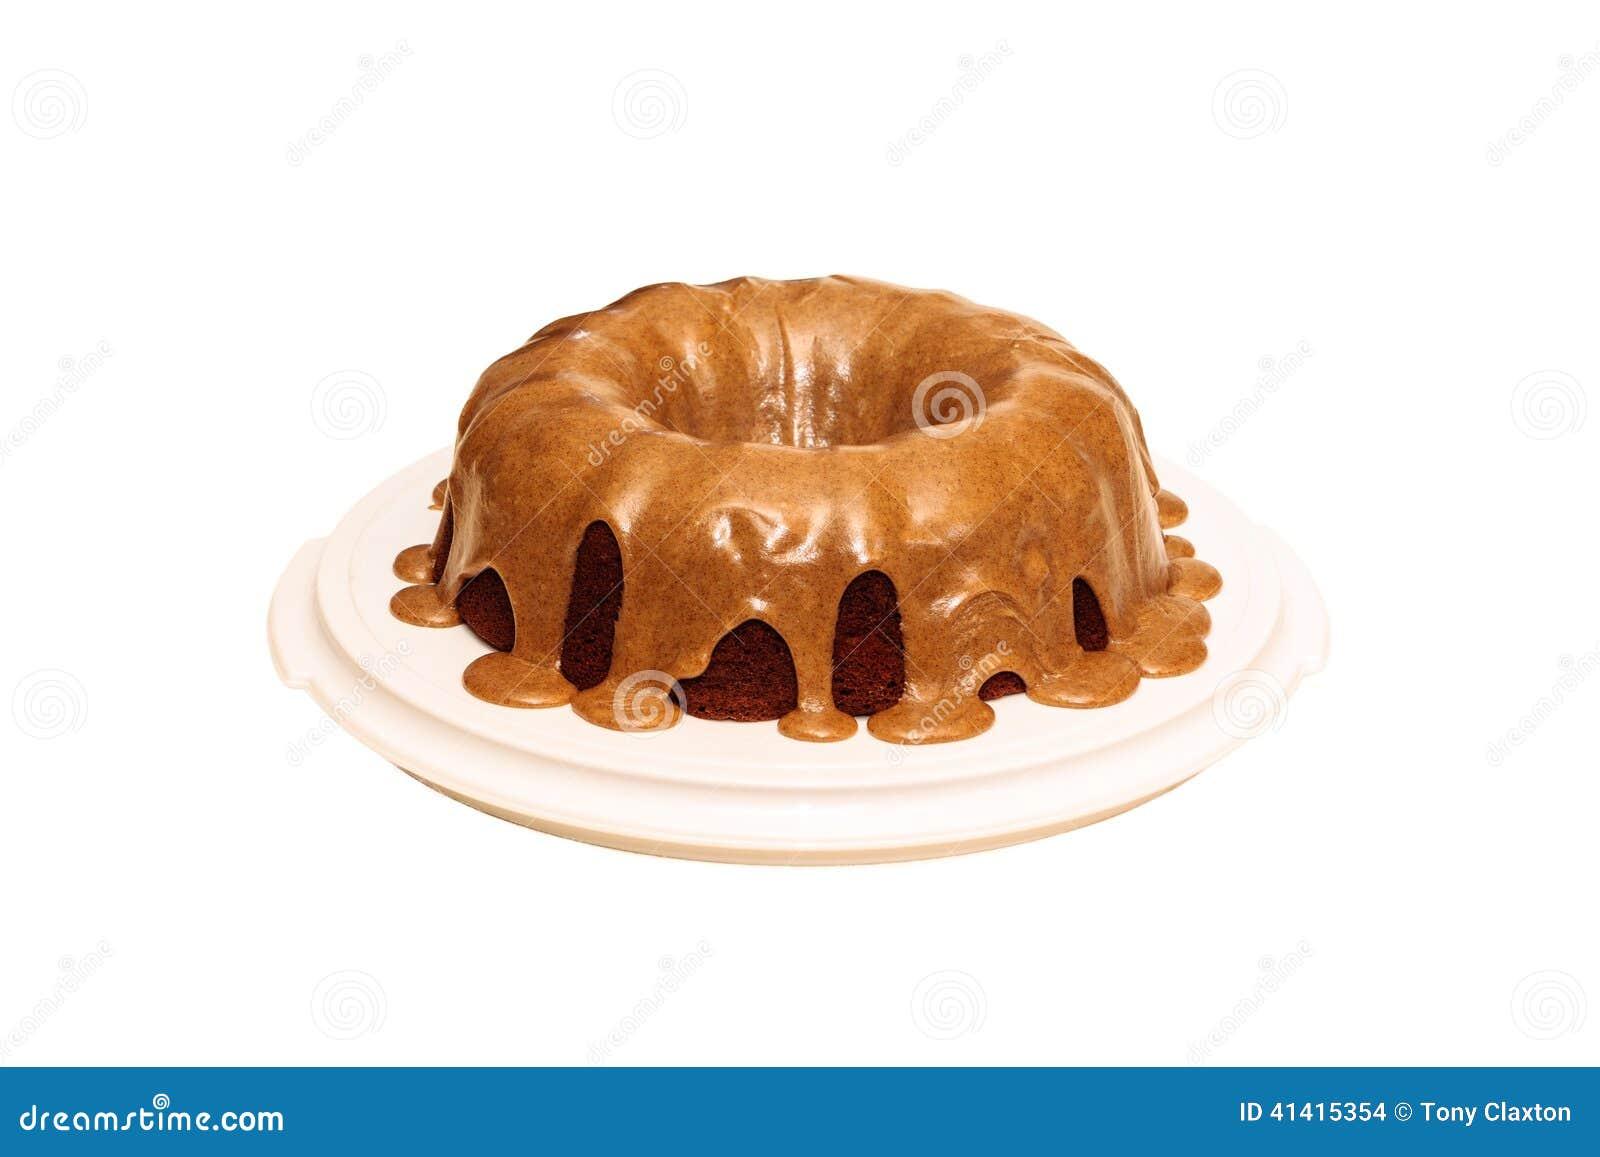 How To Make Raisin Cake At Home